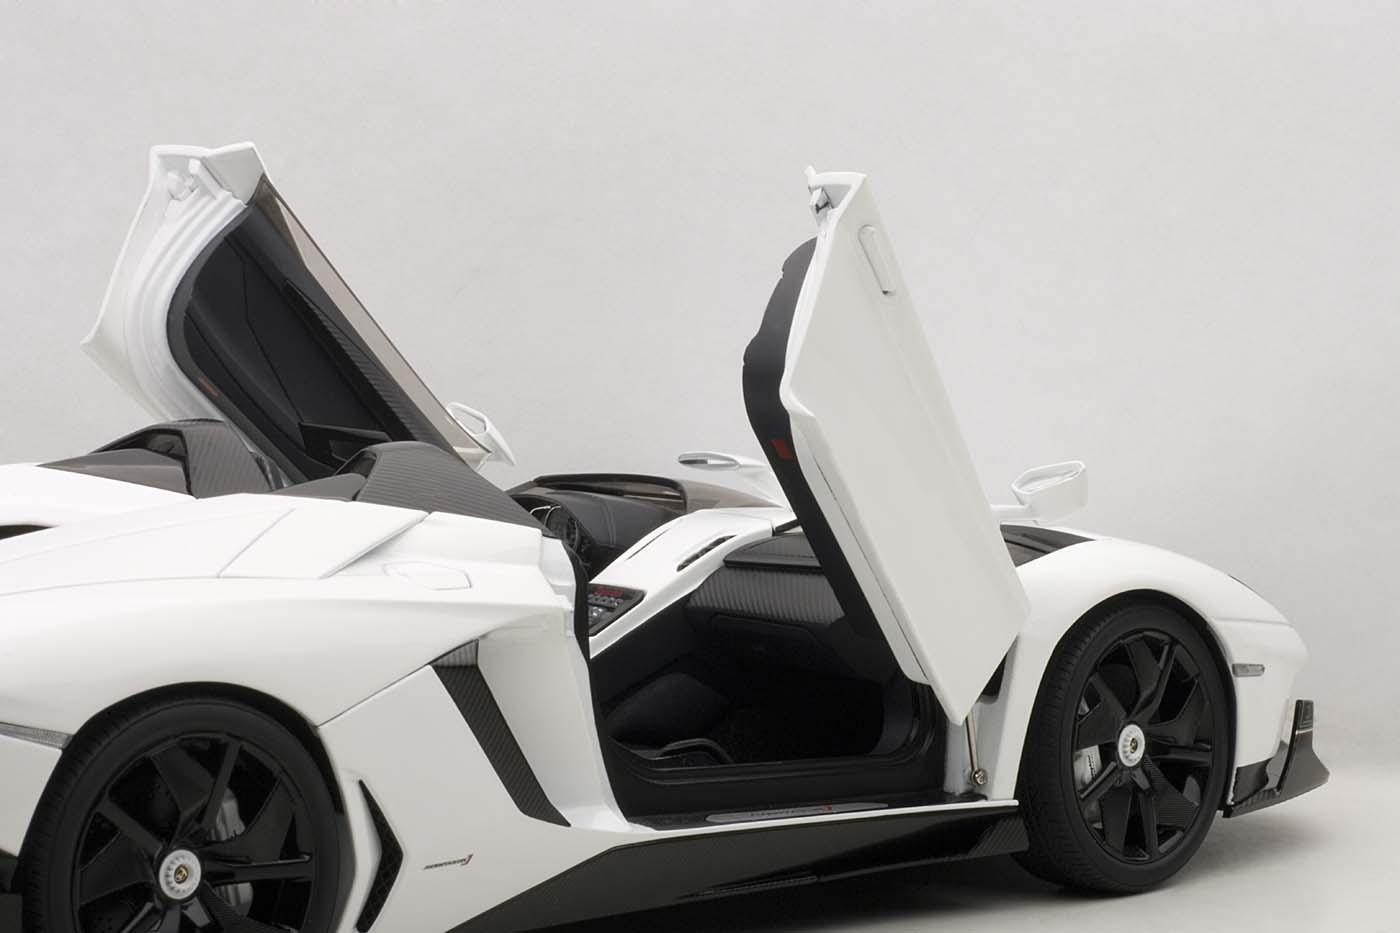 lamborghini aventador j roadster white 74674 autoart die cast scale model 1